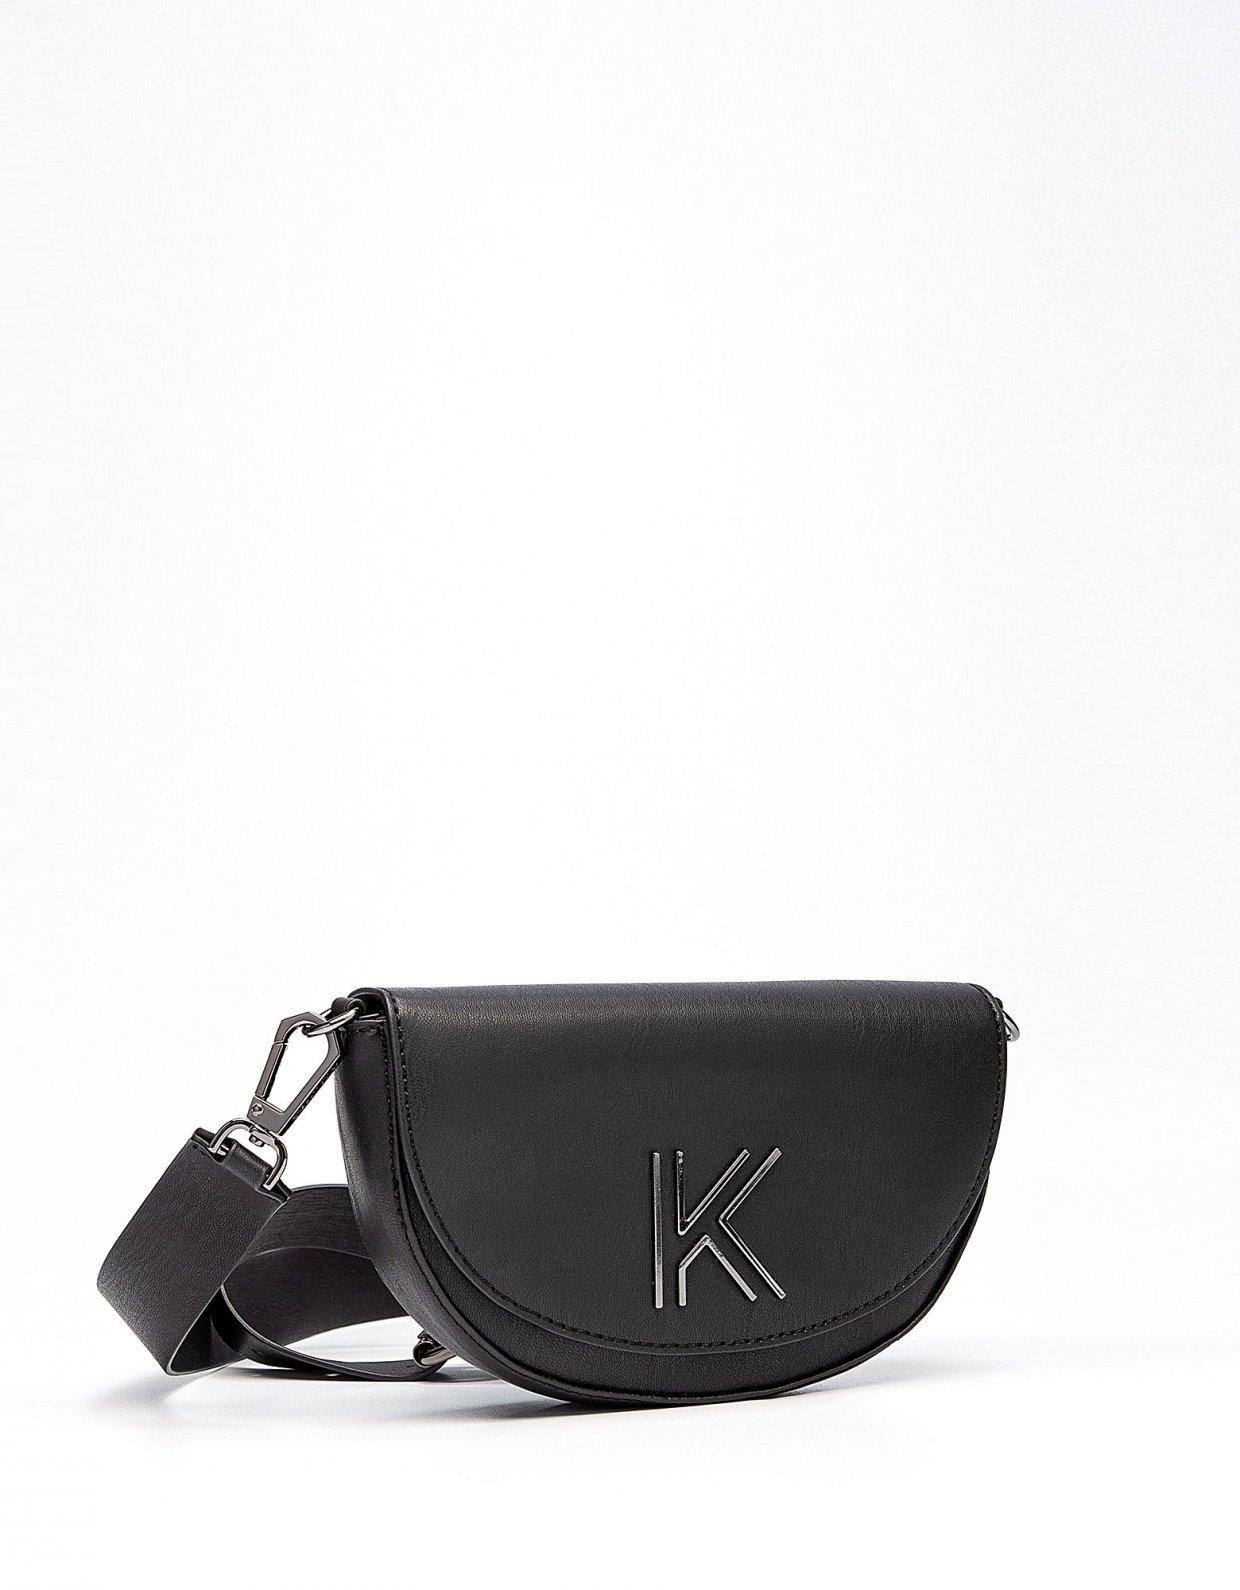 Kendall + Kylie Cynthia waist bag black